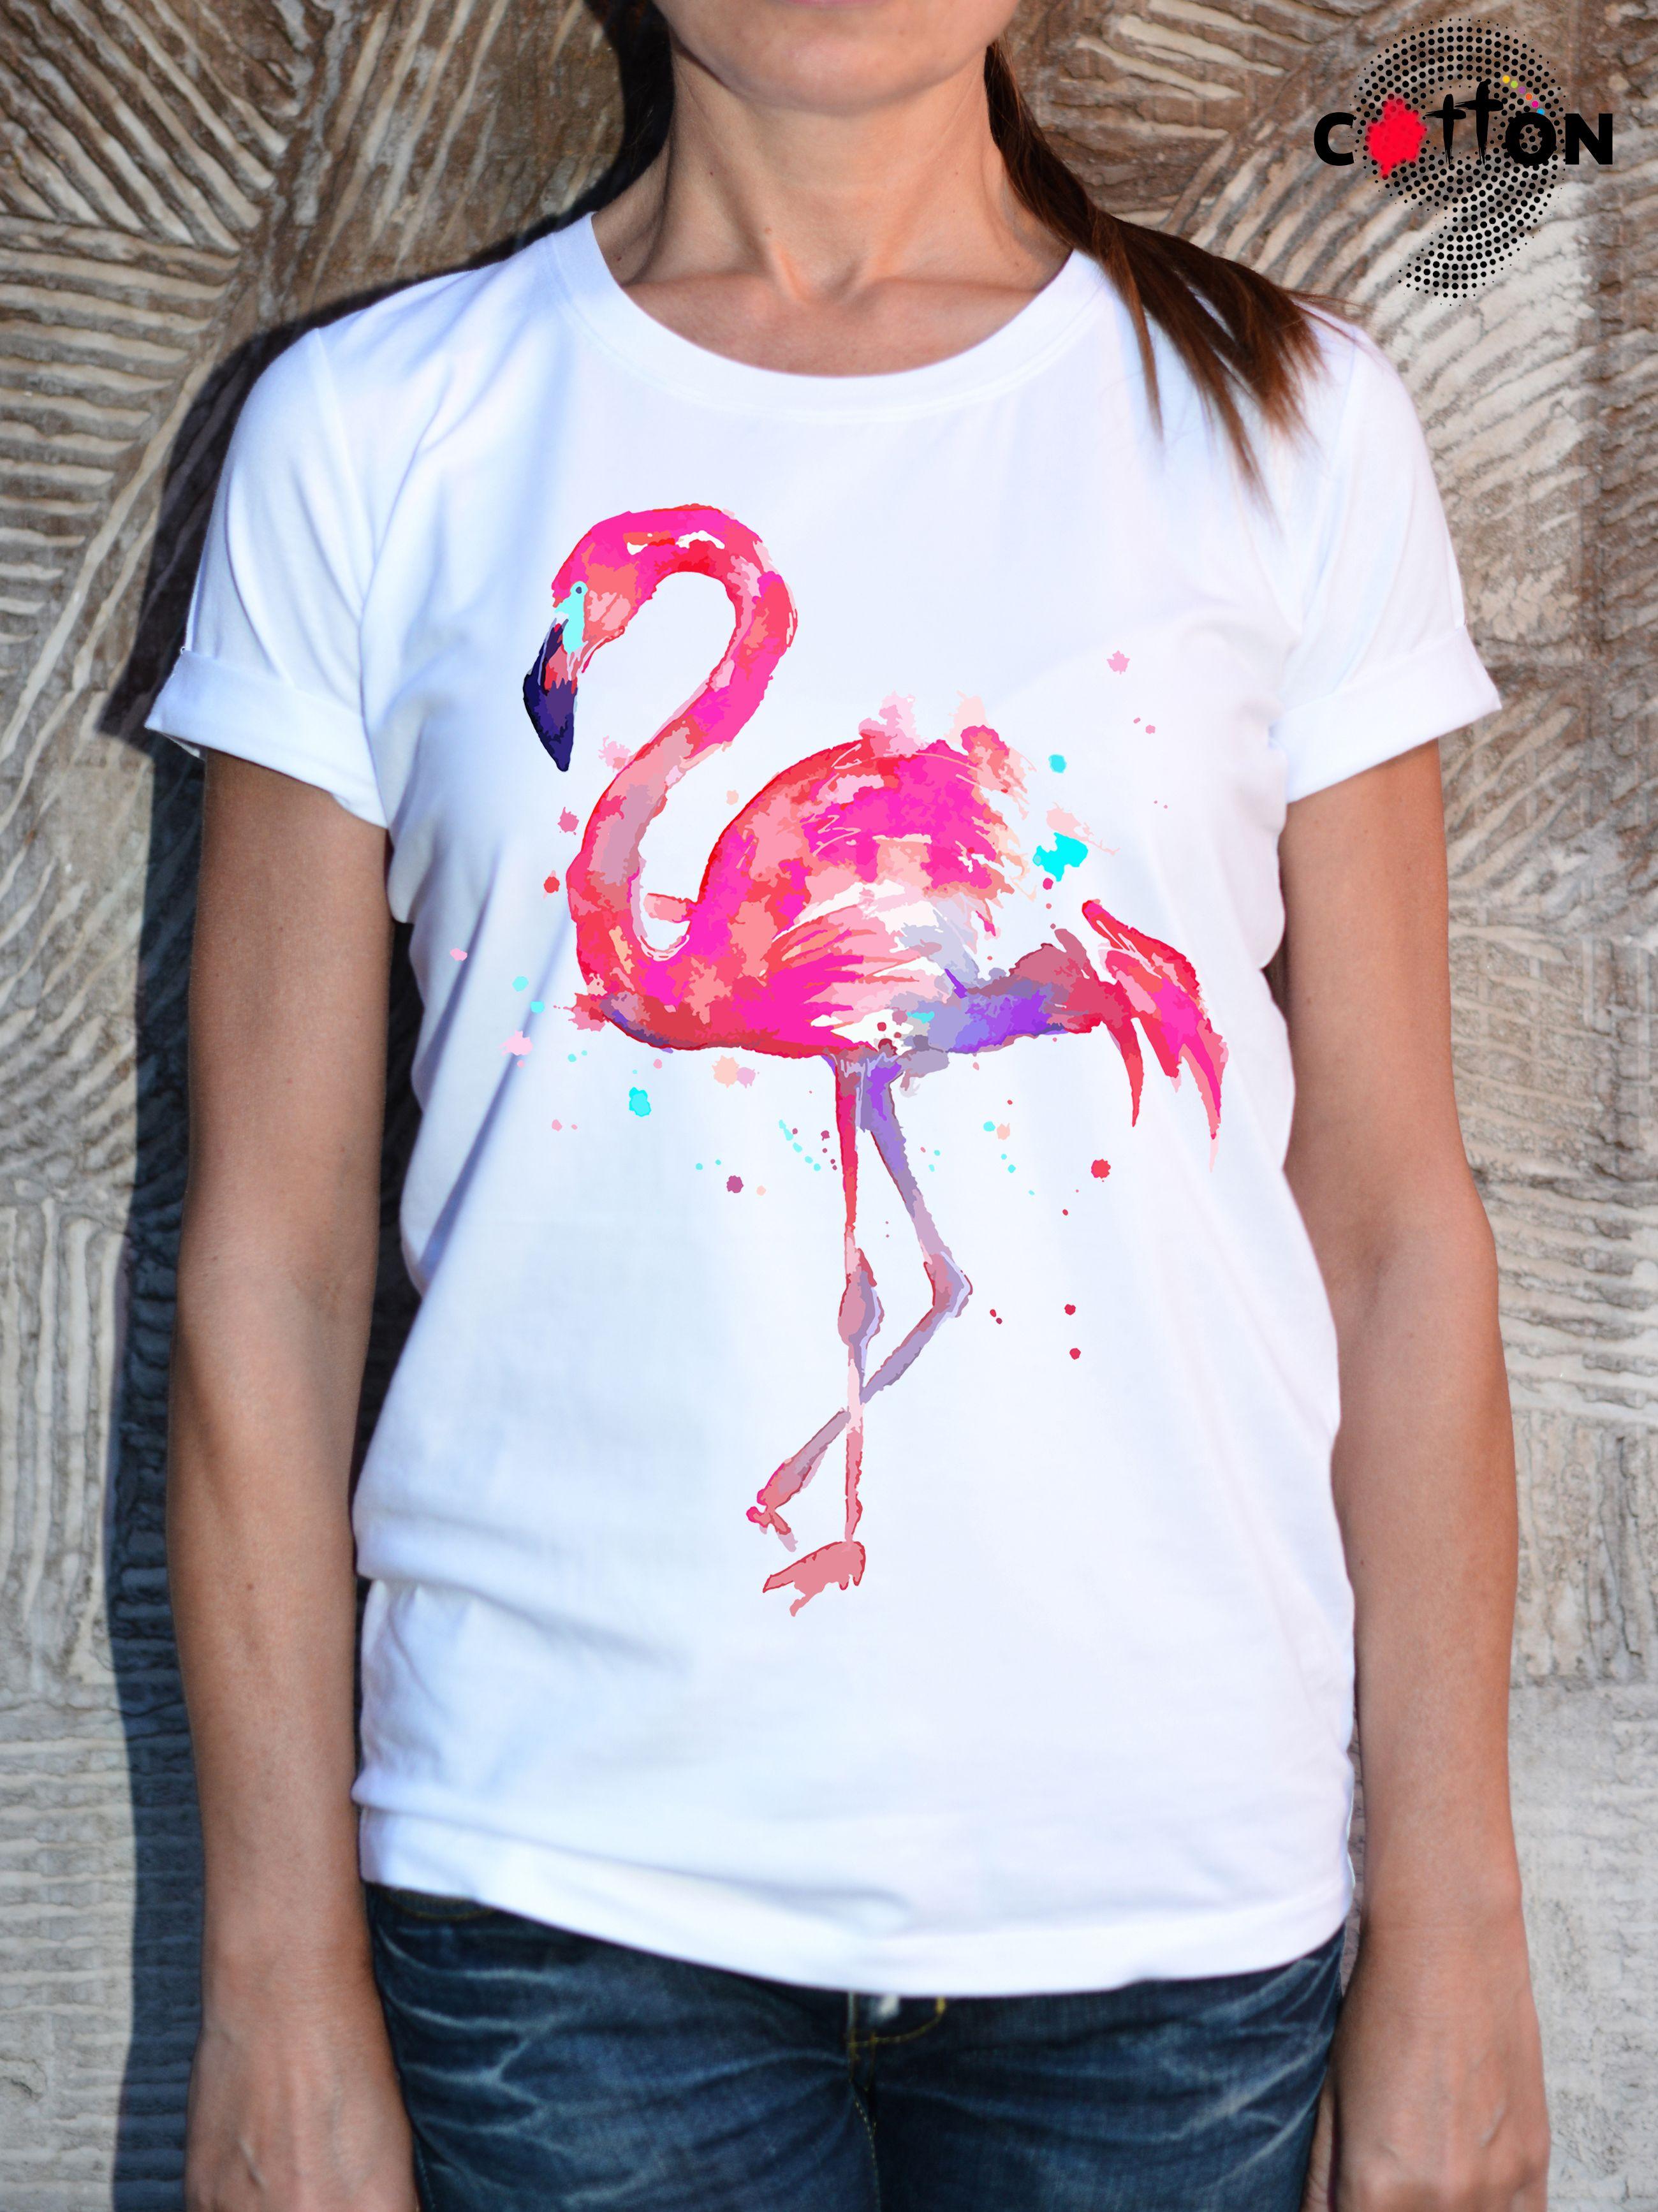 b8ce0d329 Pink Flamingo Print Art Cotton T-Shirt | Animal Print T-Shirts by ...